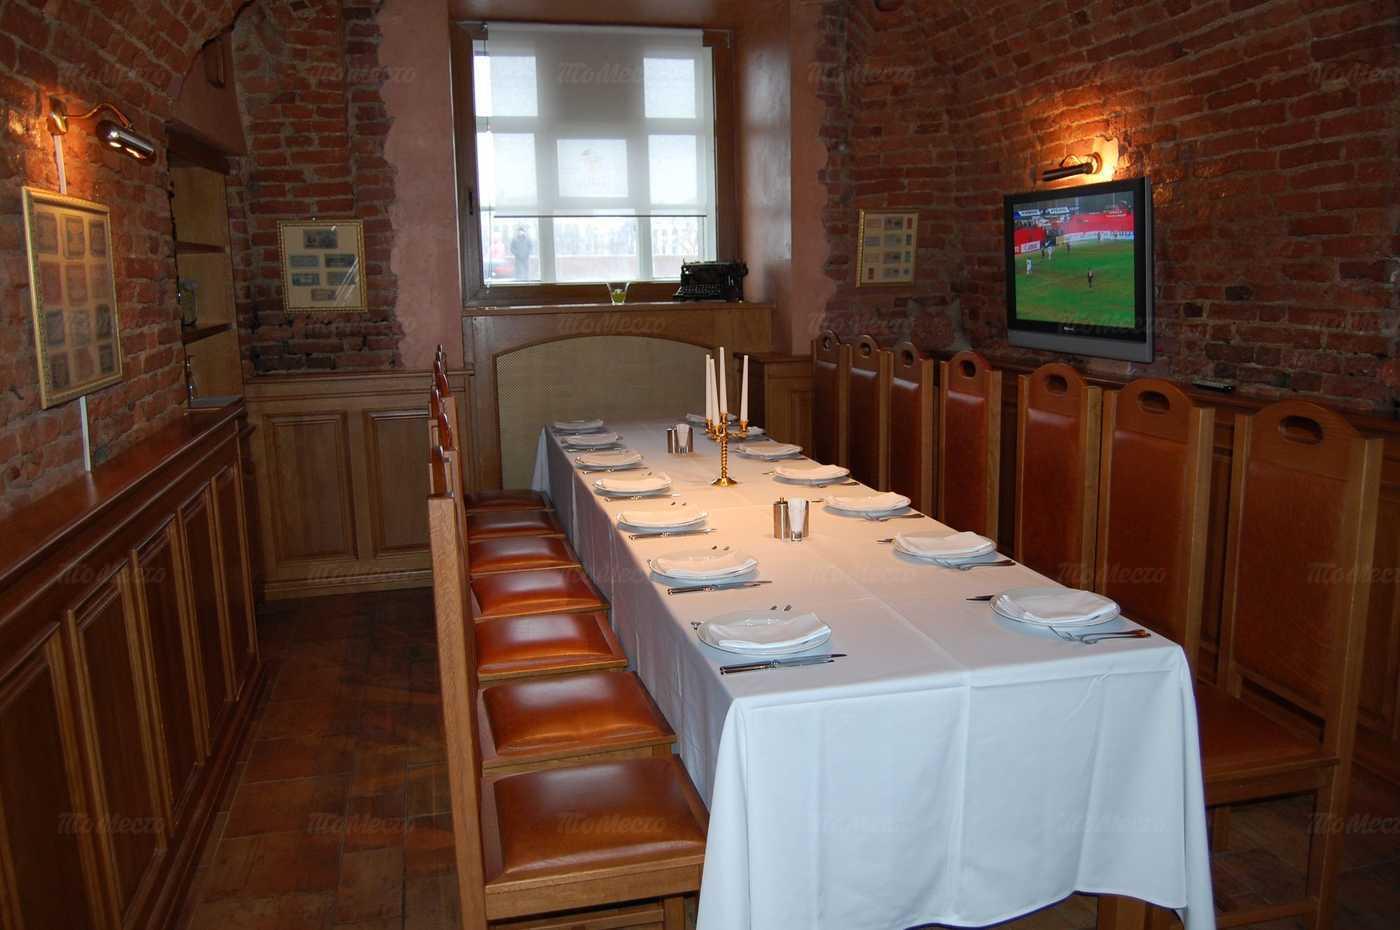 Ресторан Град Петров на Университетской набережной фото 9